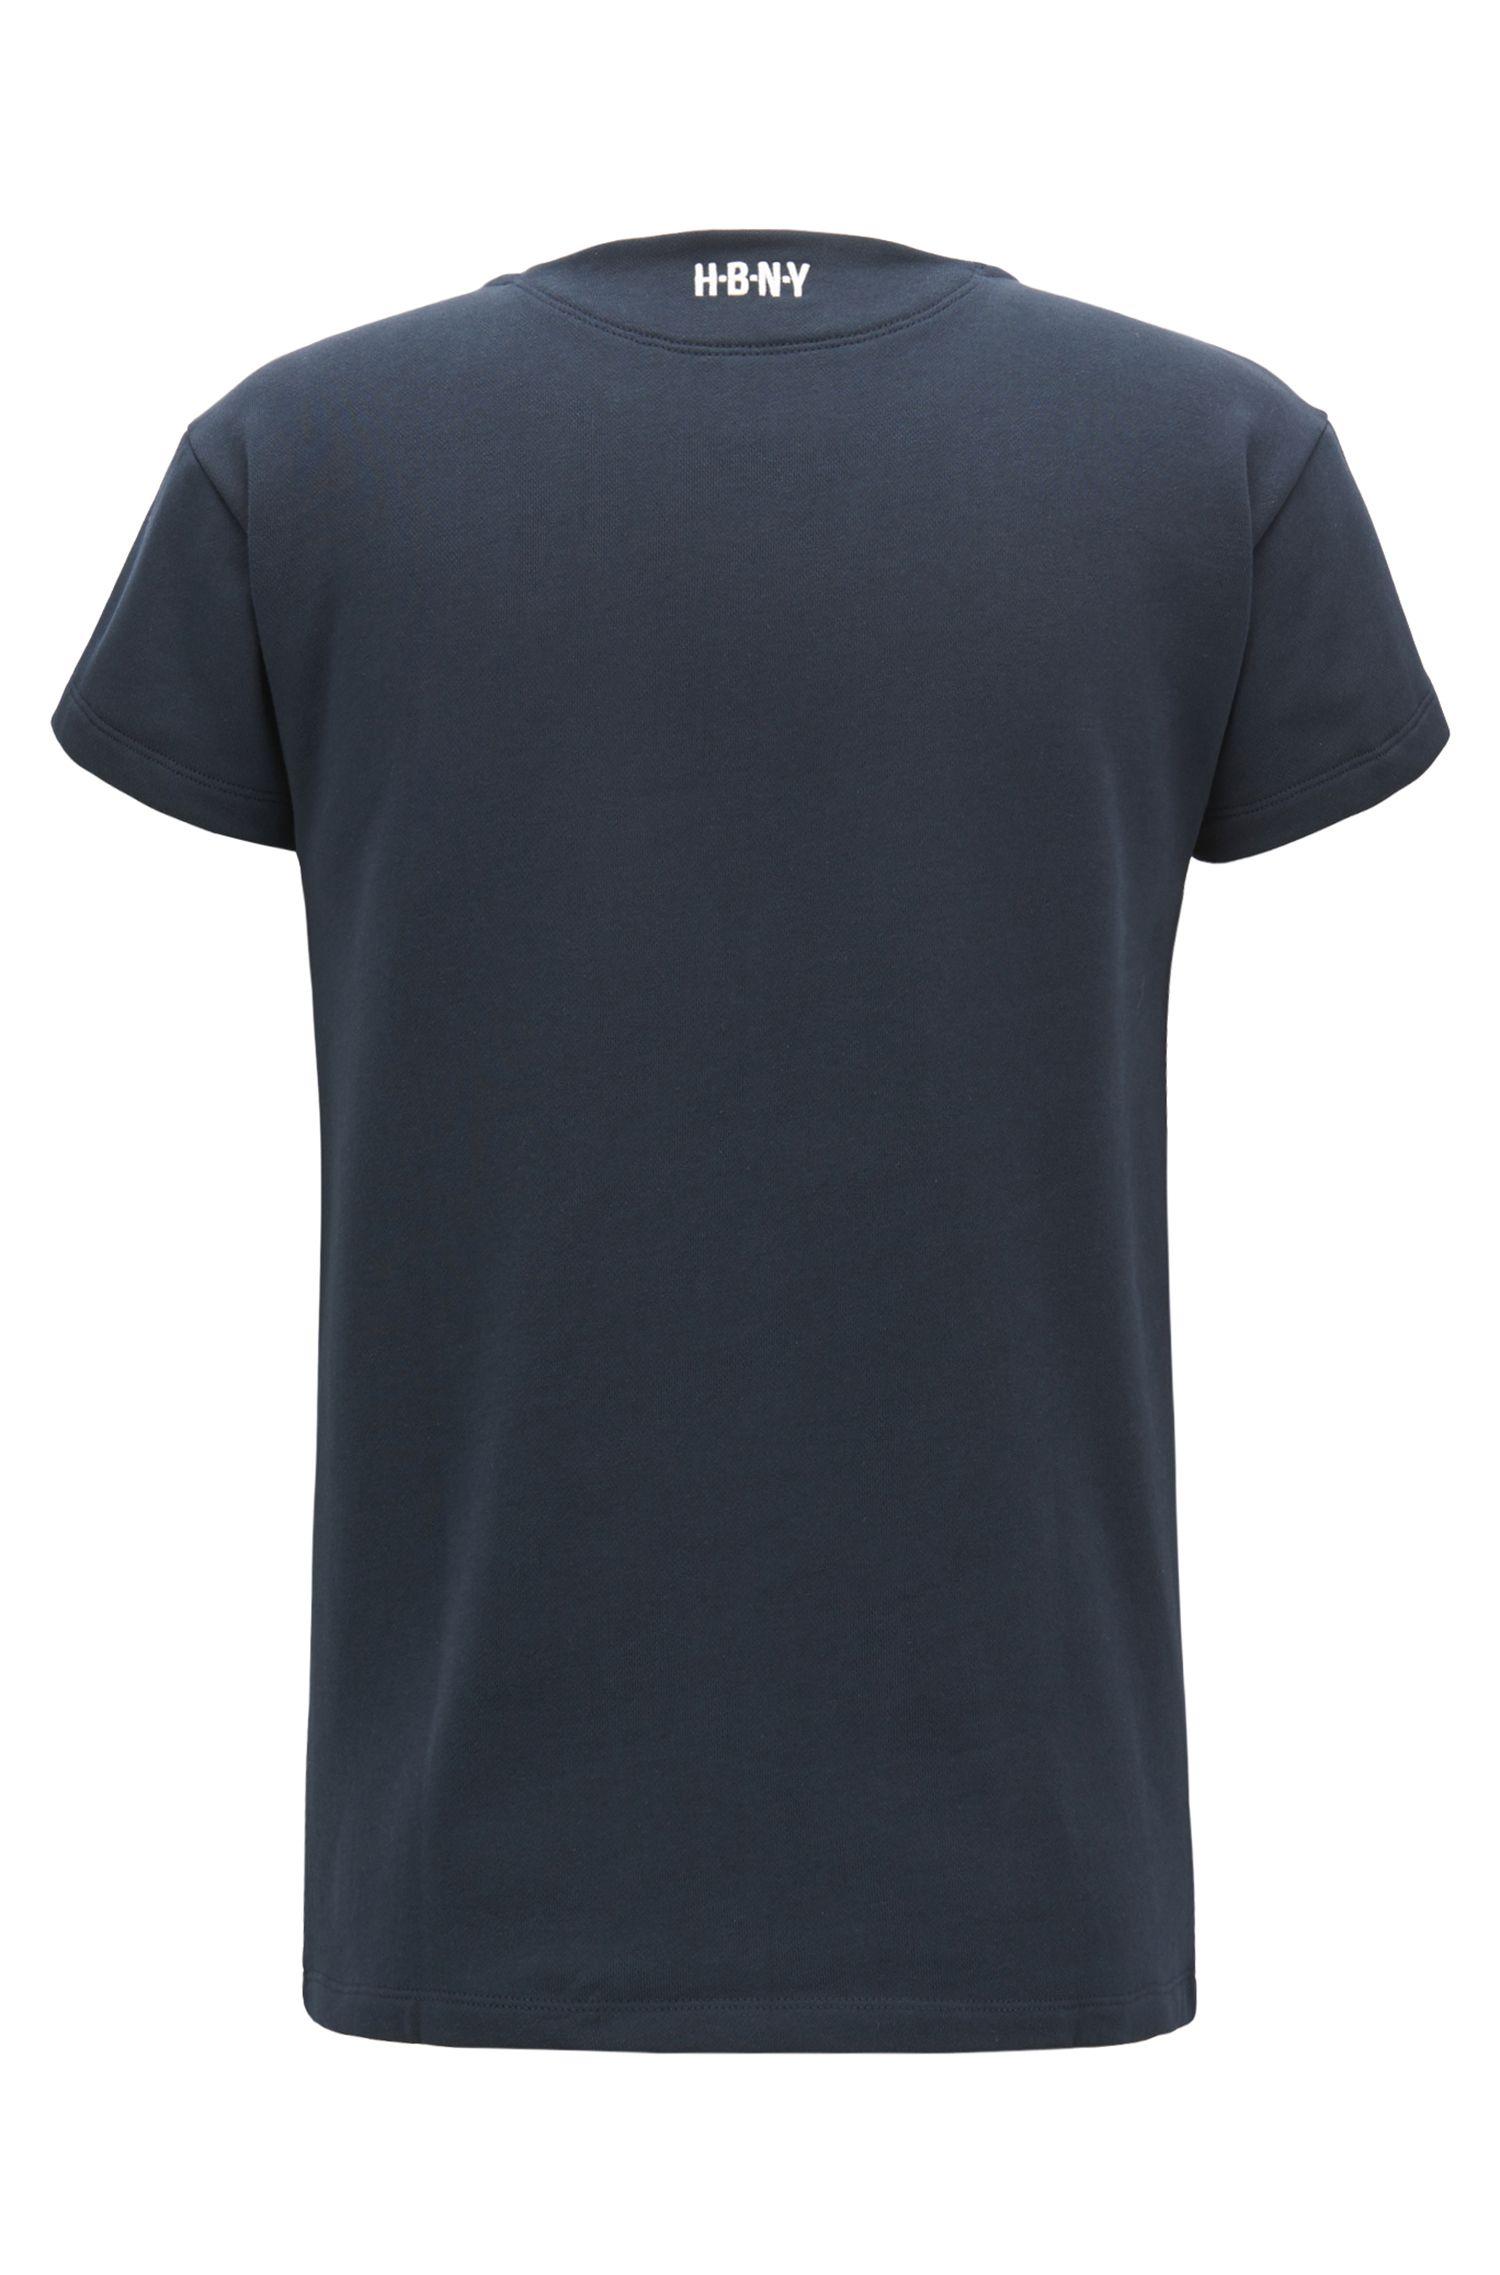 Printed Cotton Jersey T-Shirt | Tasman, Open Blue